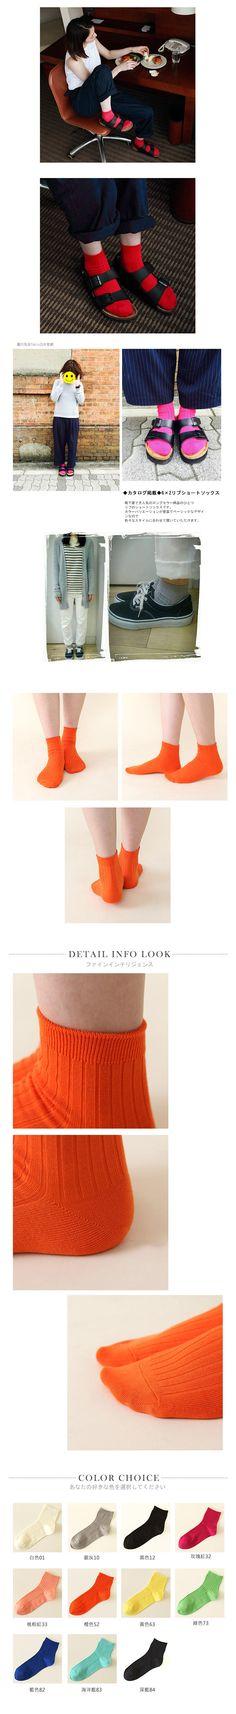 Tabio日本靴下屋台灣網路旗艦店 |台灣樂天市場:靴下屋Tabio 經典羅紋純色短襪